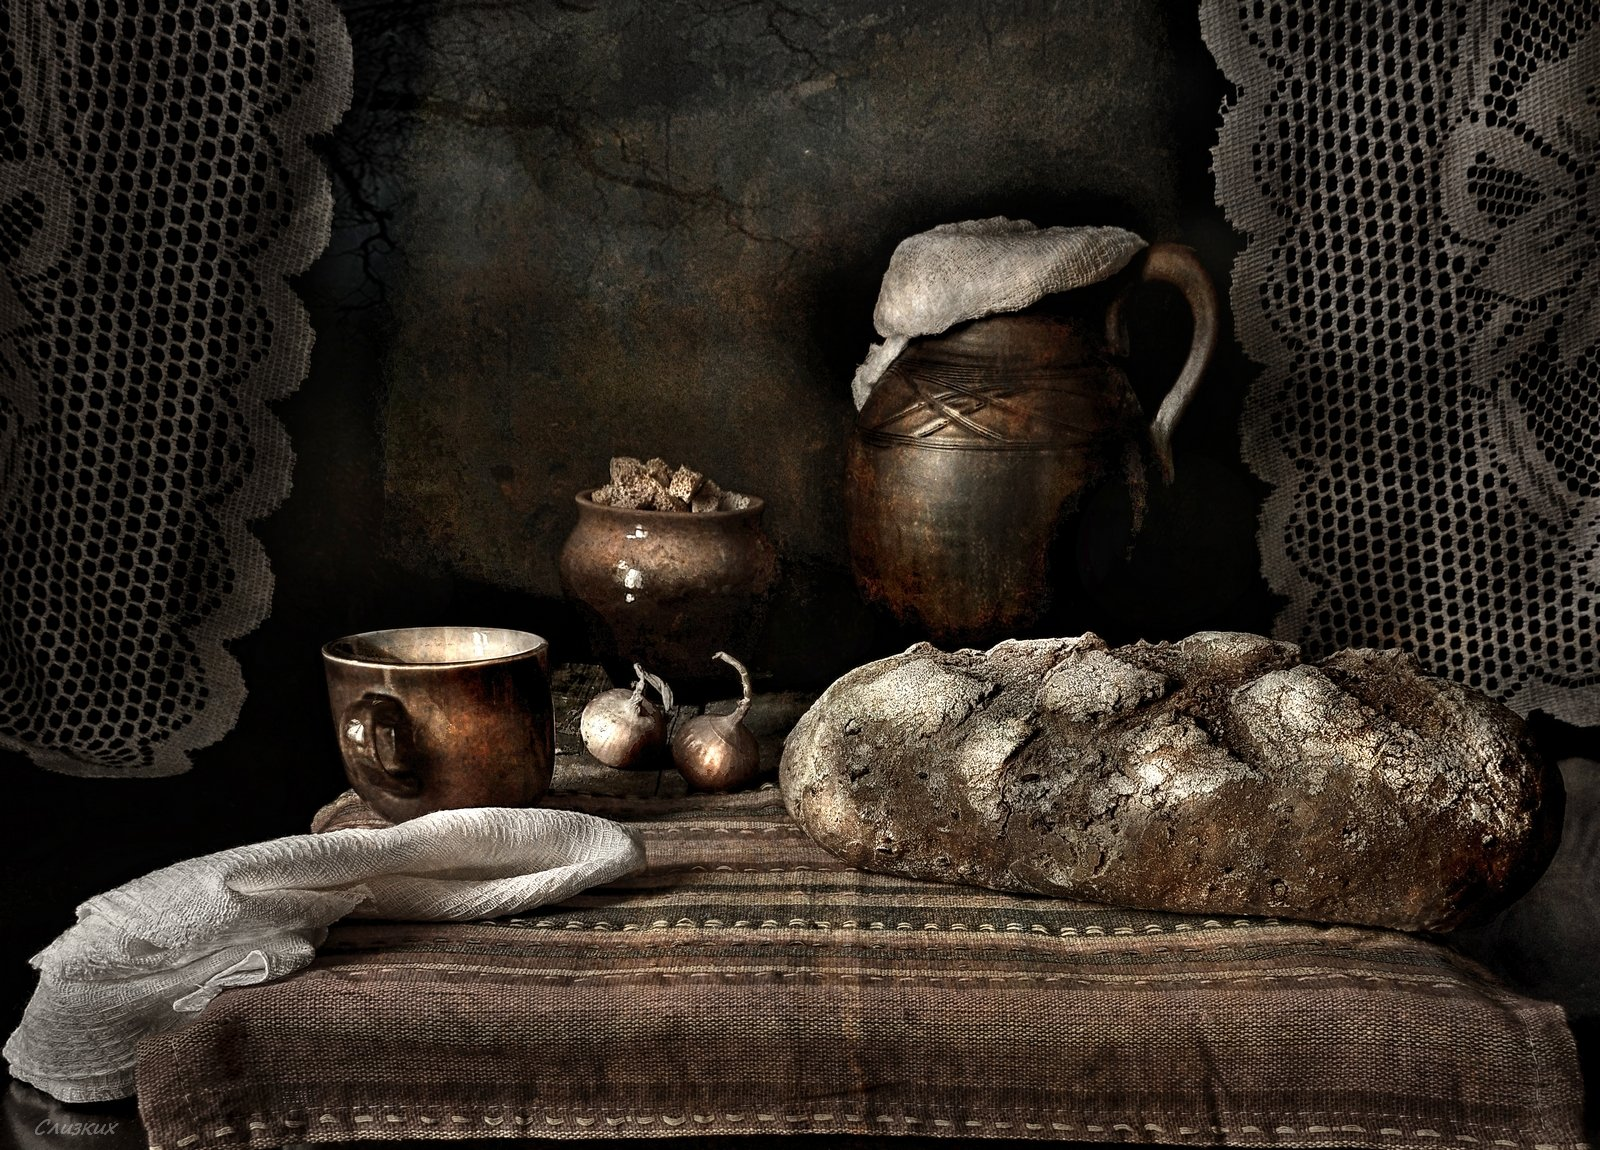 натюрморт,хлеб,традиция,кувшин,лук,весна,русь, Инаида